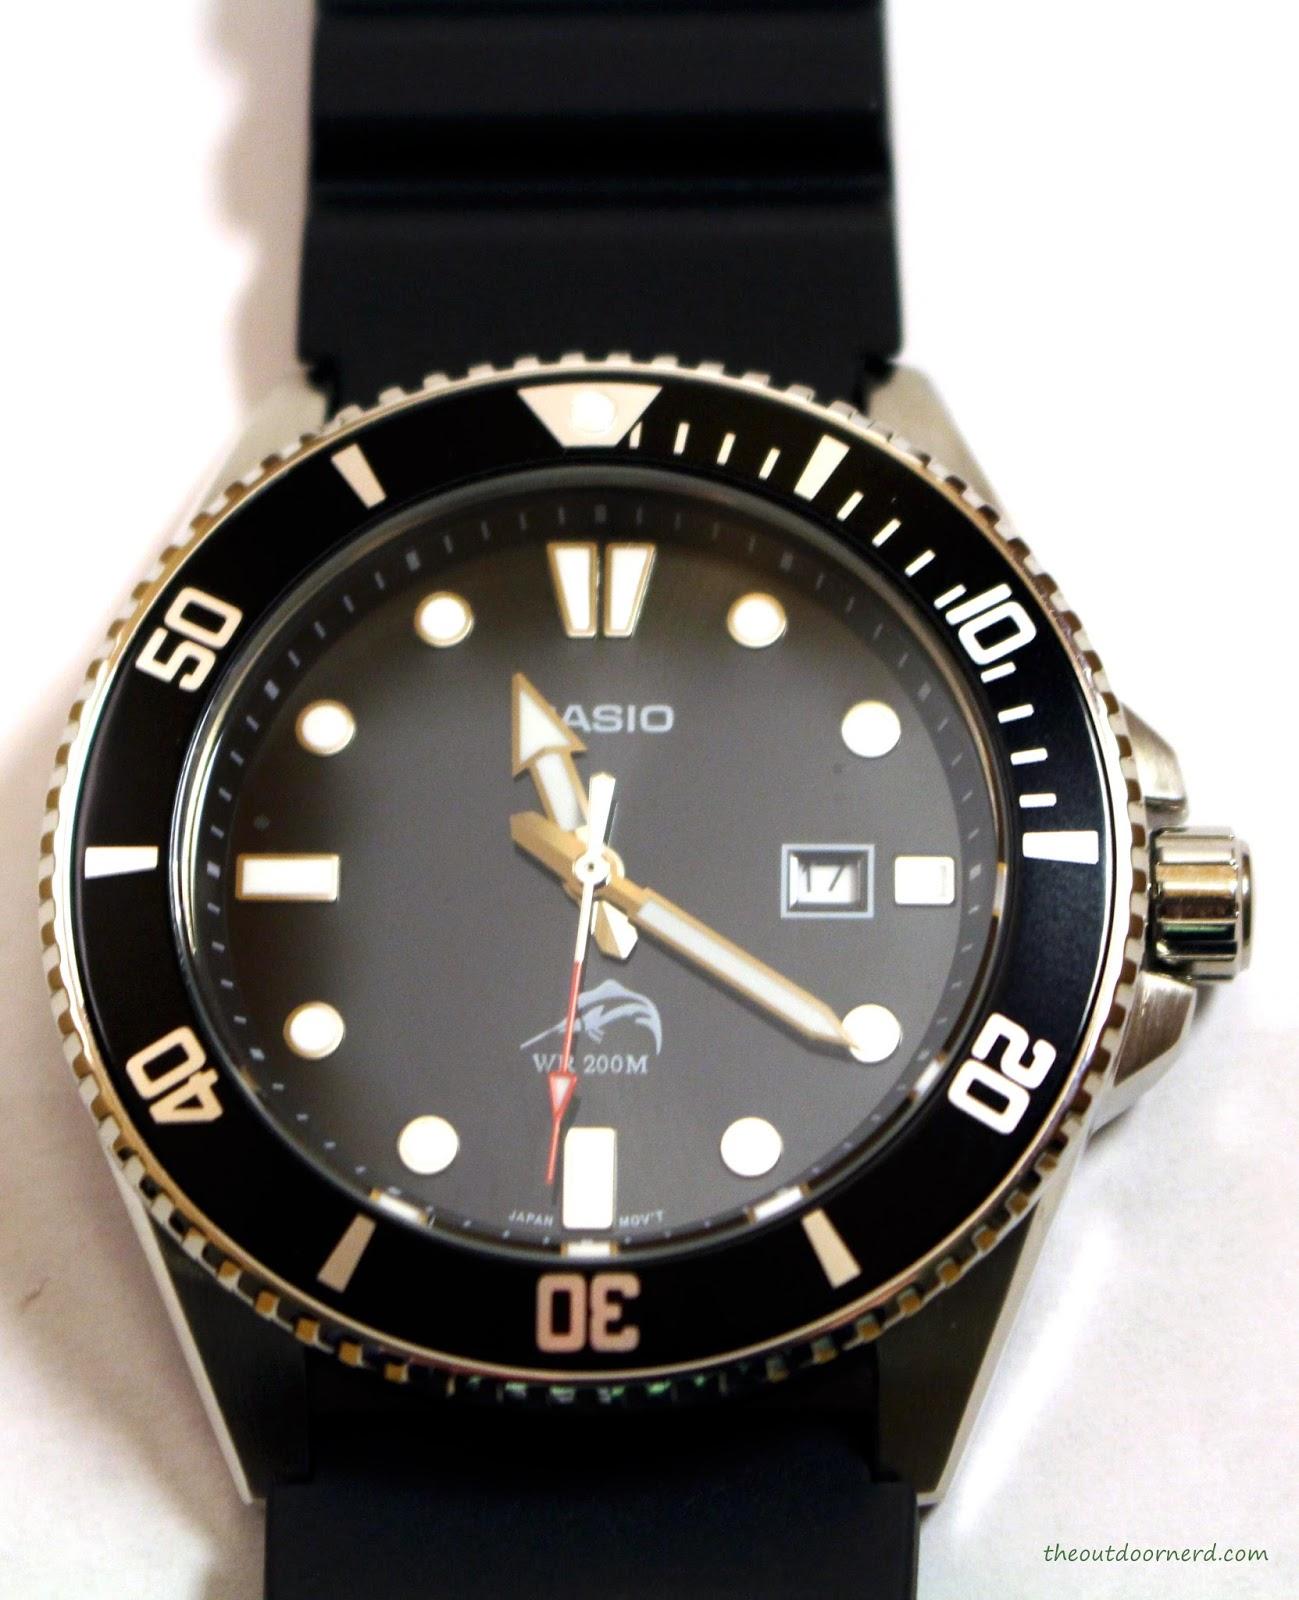 Casio MDV106-1A Diver's Watch: Closeup of Bezel